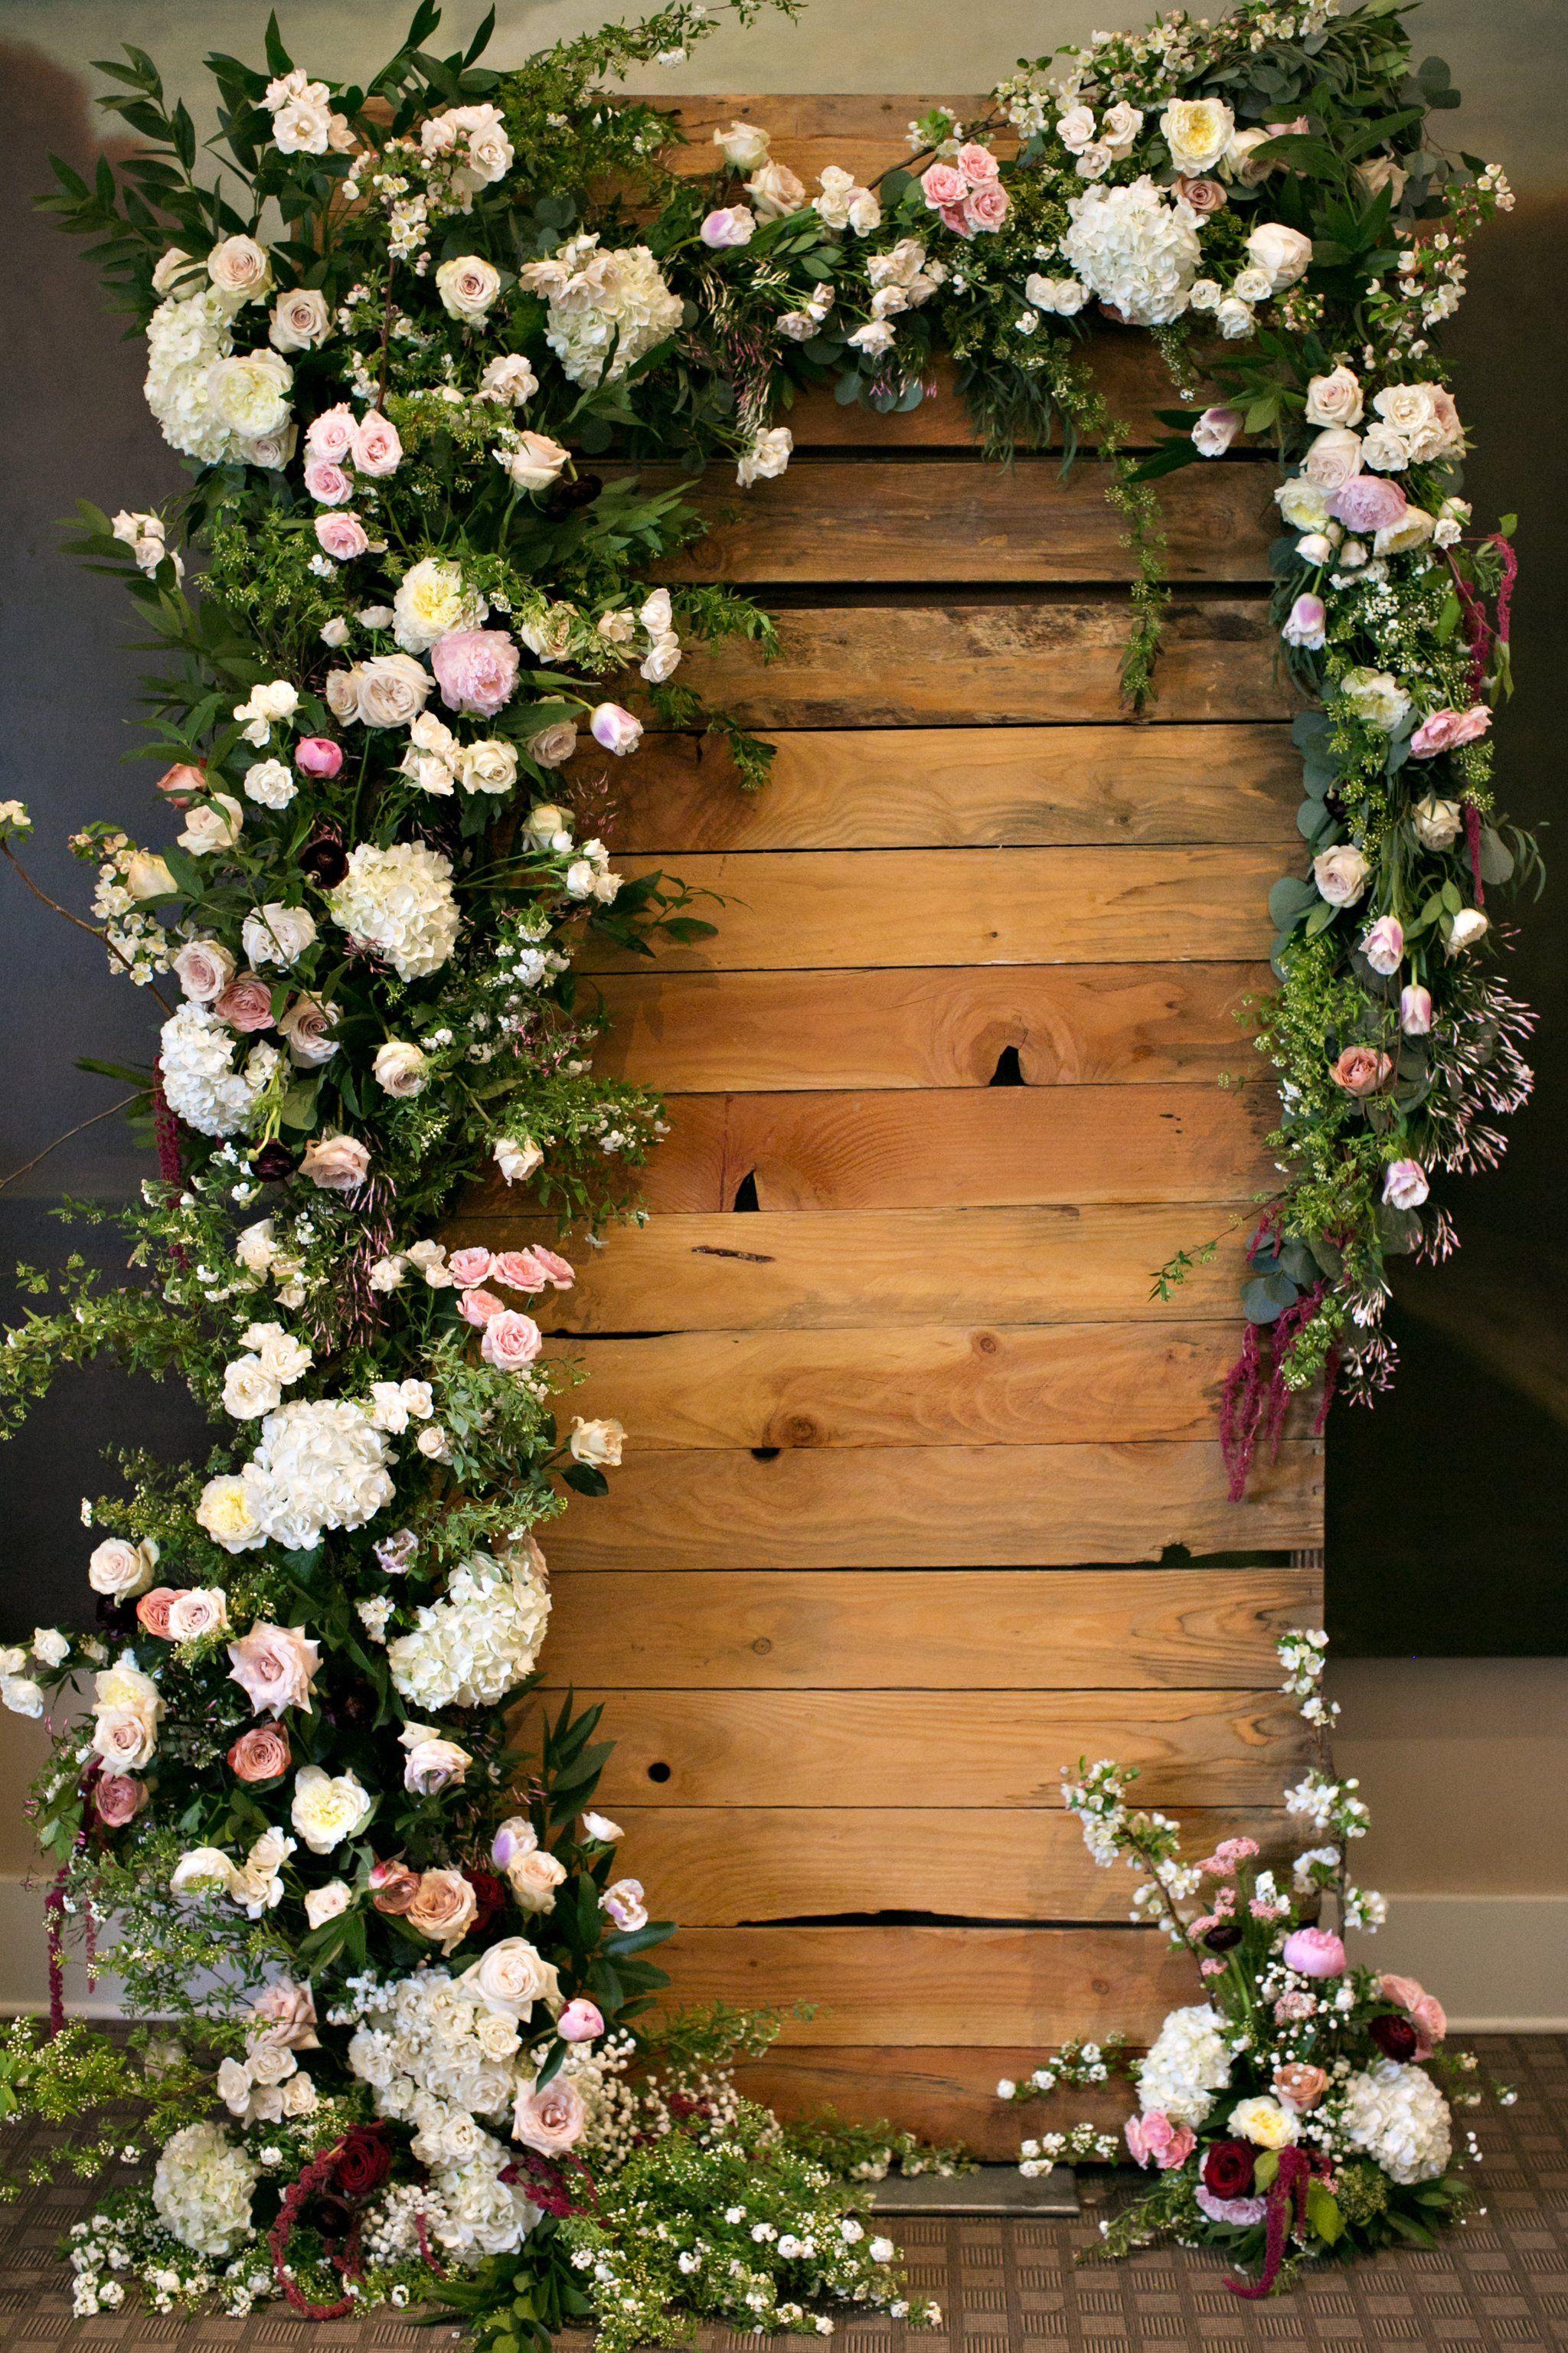 Lush Floral Displays | Wedding Backdrops | Pinterest | Hochzeit deko ...